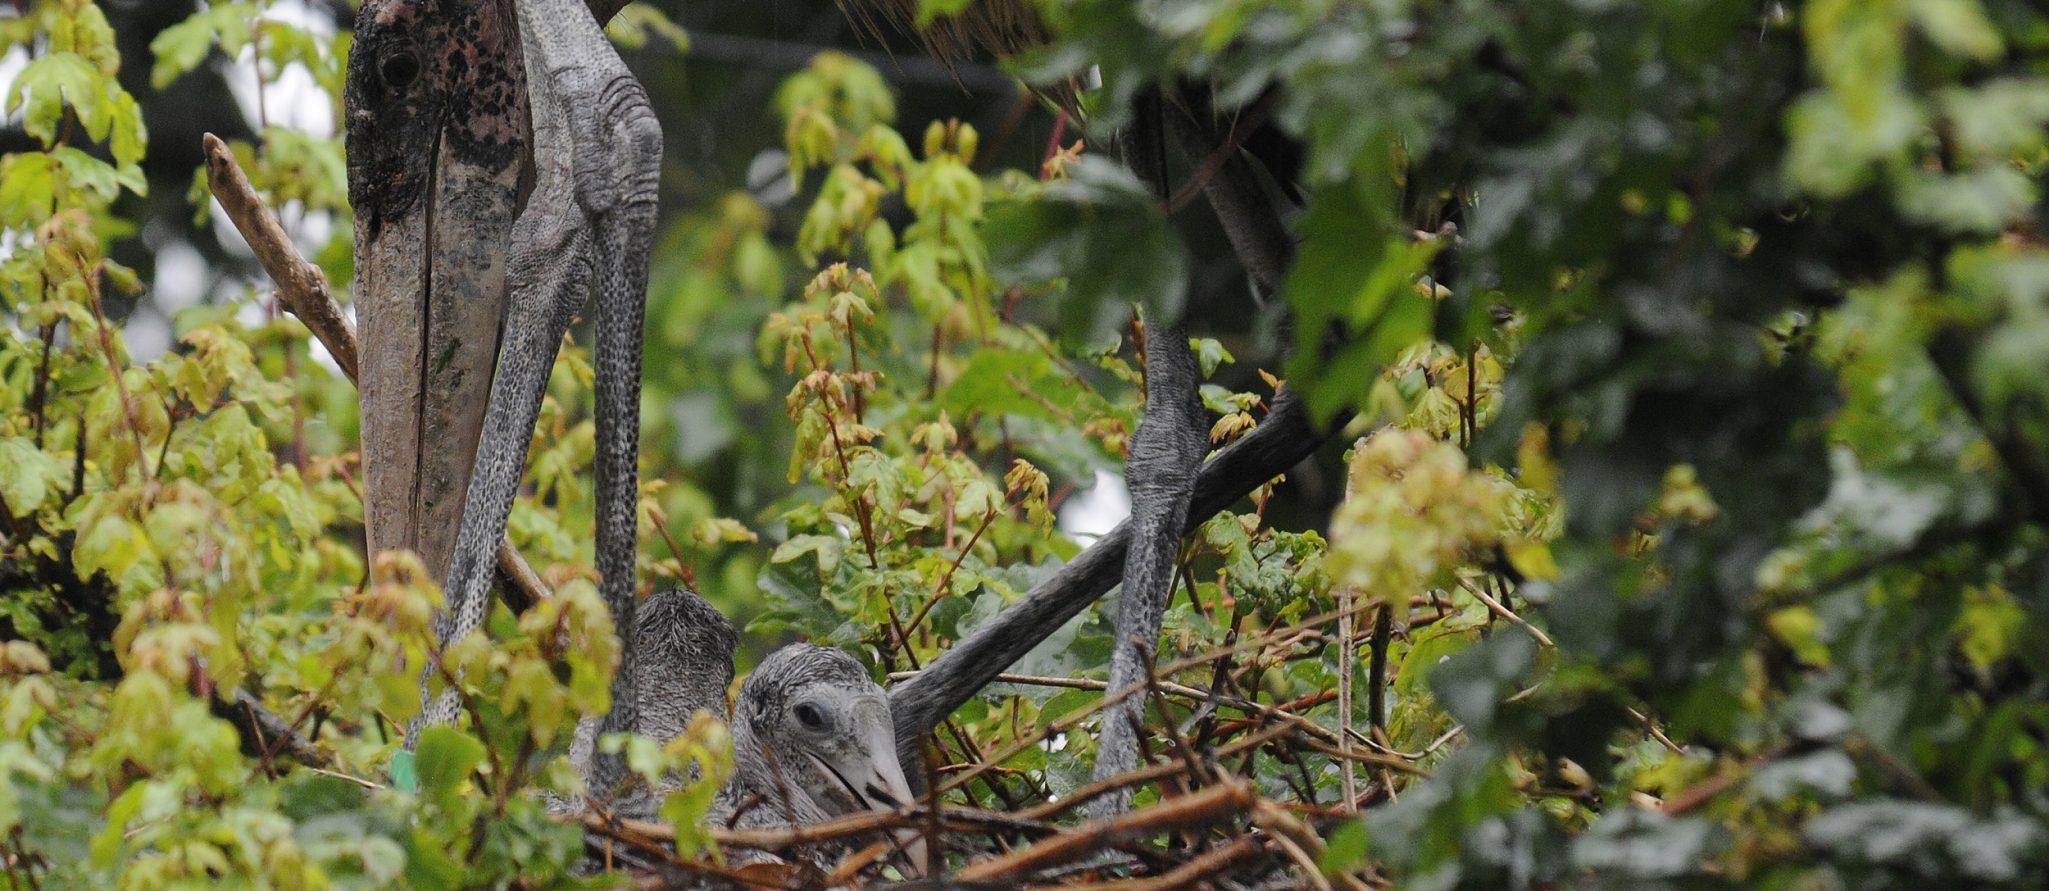 marabou stork chick